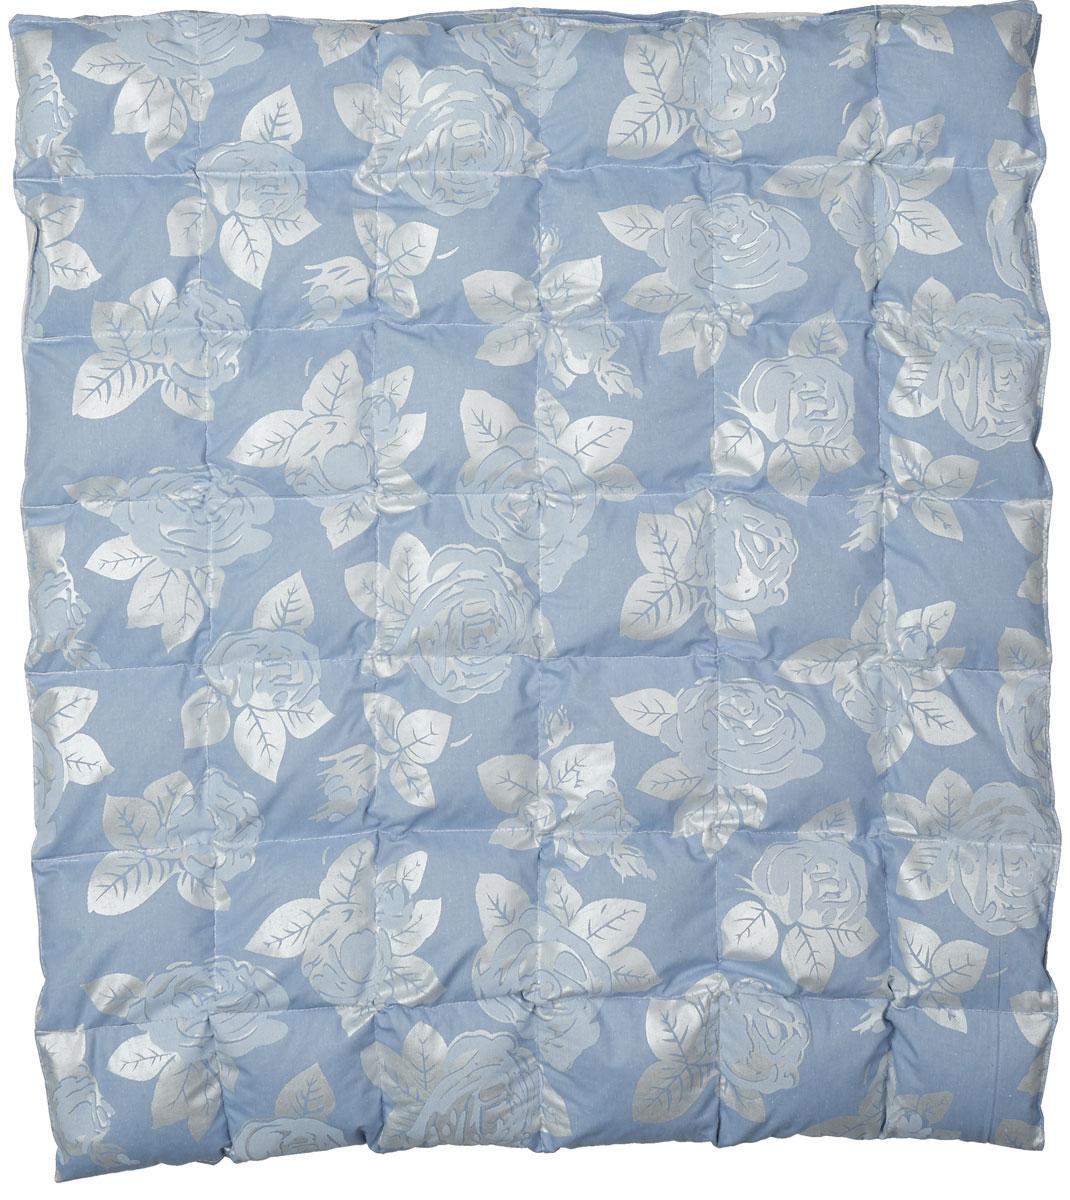 Наматрасник Bio-Textiles, наполнитель: лузга гречихи, 160 х 195 см